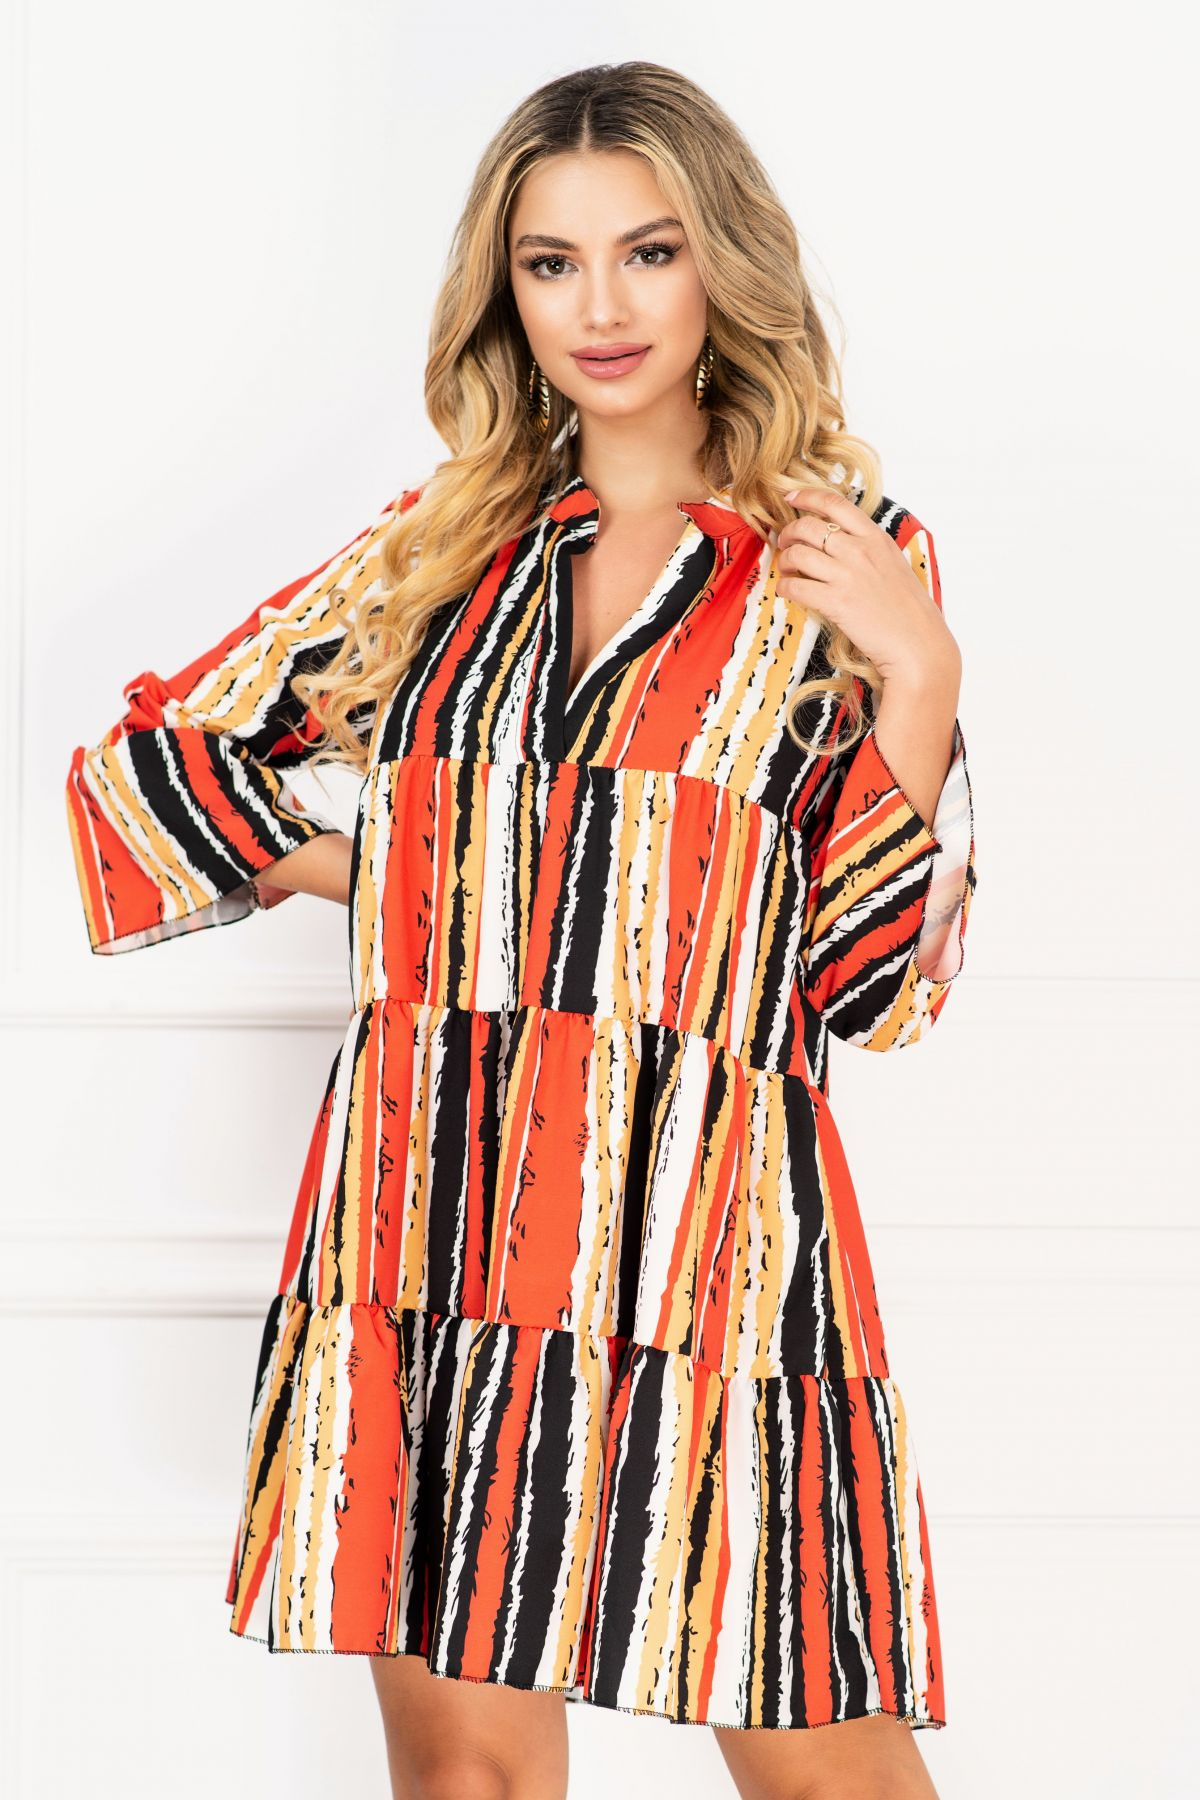 Rochie de vara vaporoasa cu imprimeu dungi colorate si volane